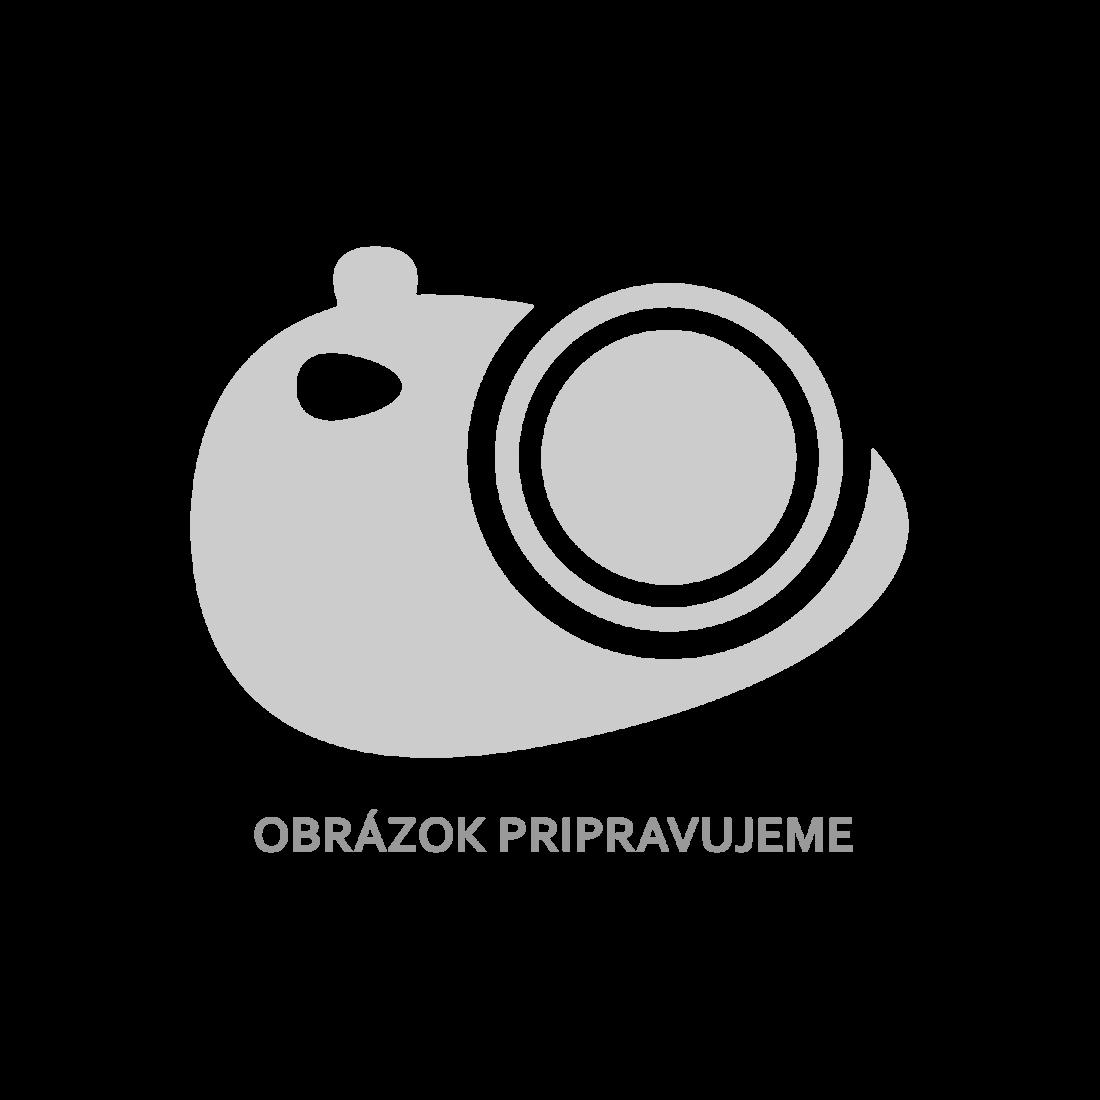 vidaXL Barové židle s područkami 2 ks tmavě šedé textil [249571]